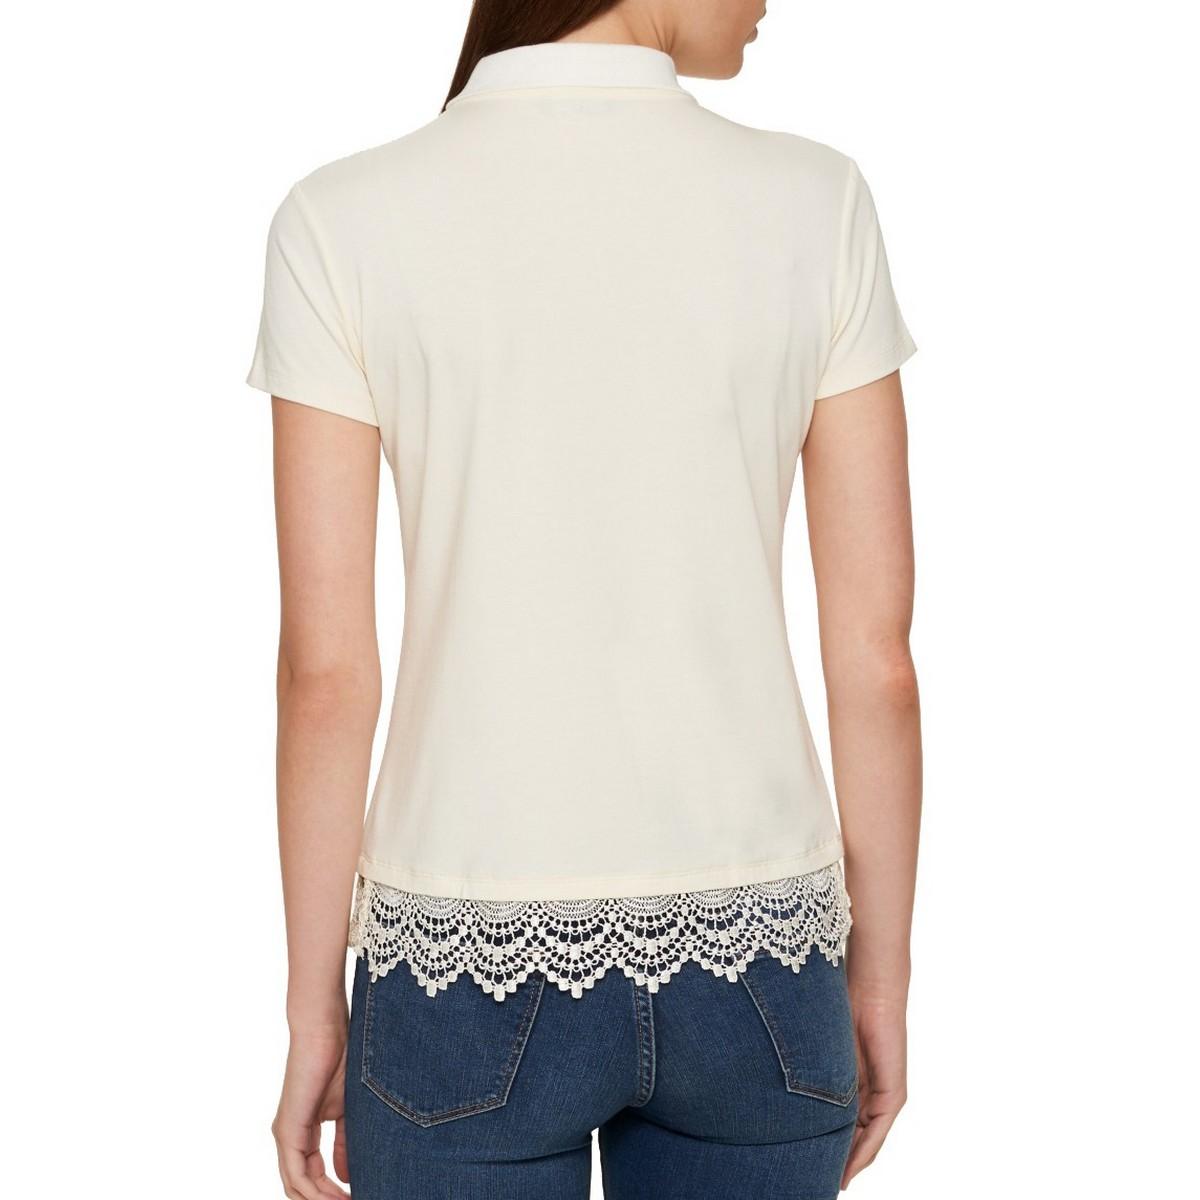 TOMMY-HILFIGER-NEW-Women-039-s-Lace-Trim-Polo-Shirt-Top-TEDO thumbnail 7